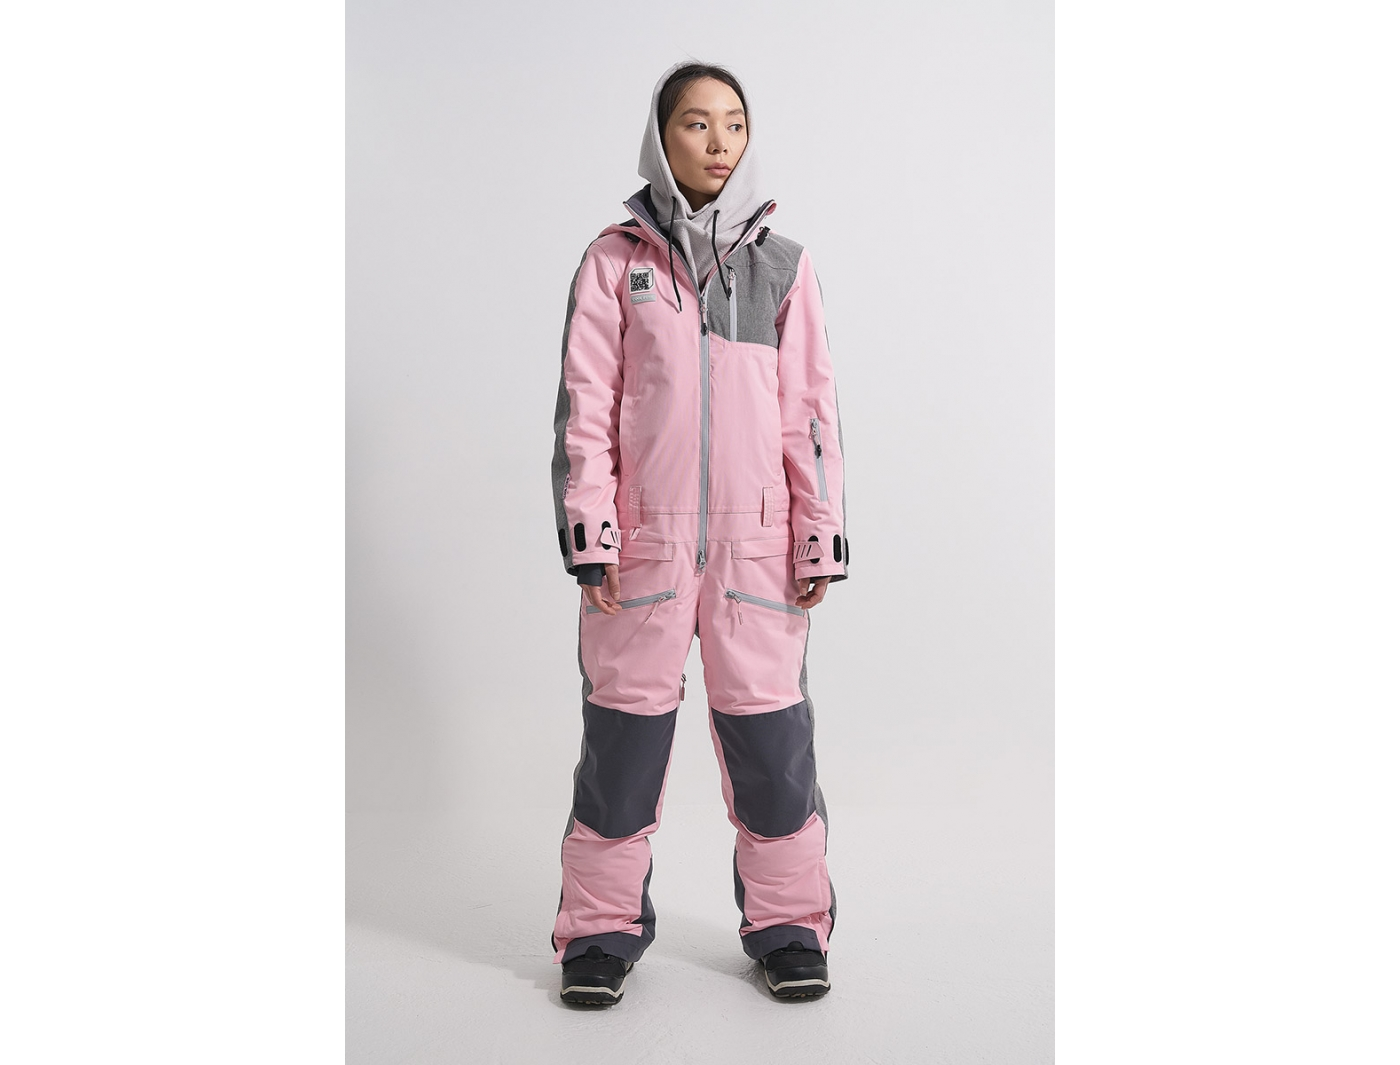 Комбинезон OVER KN1124/26/31М светло-розовый/серый меланж (2022)